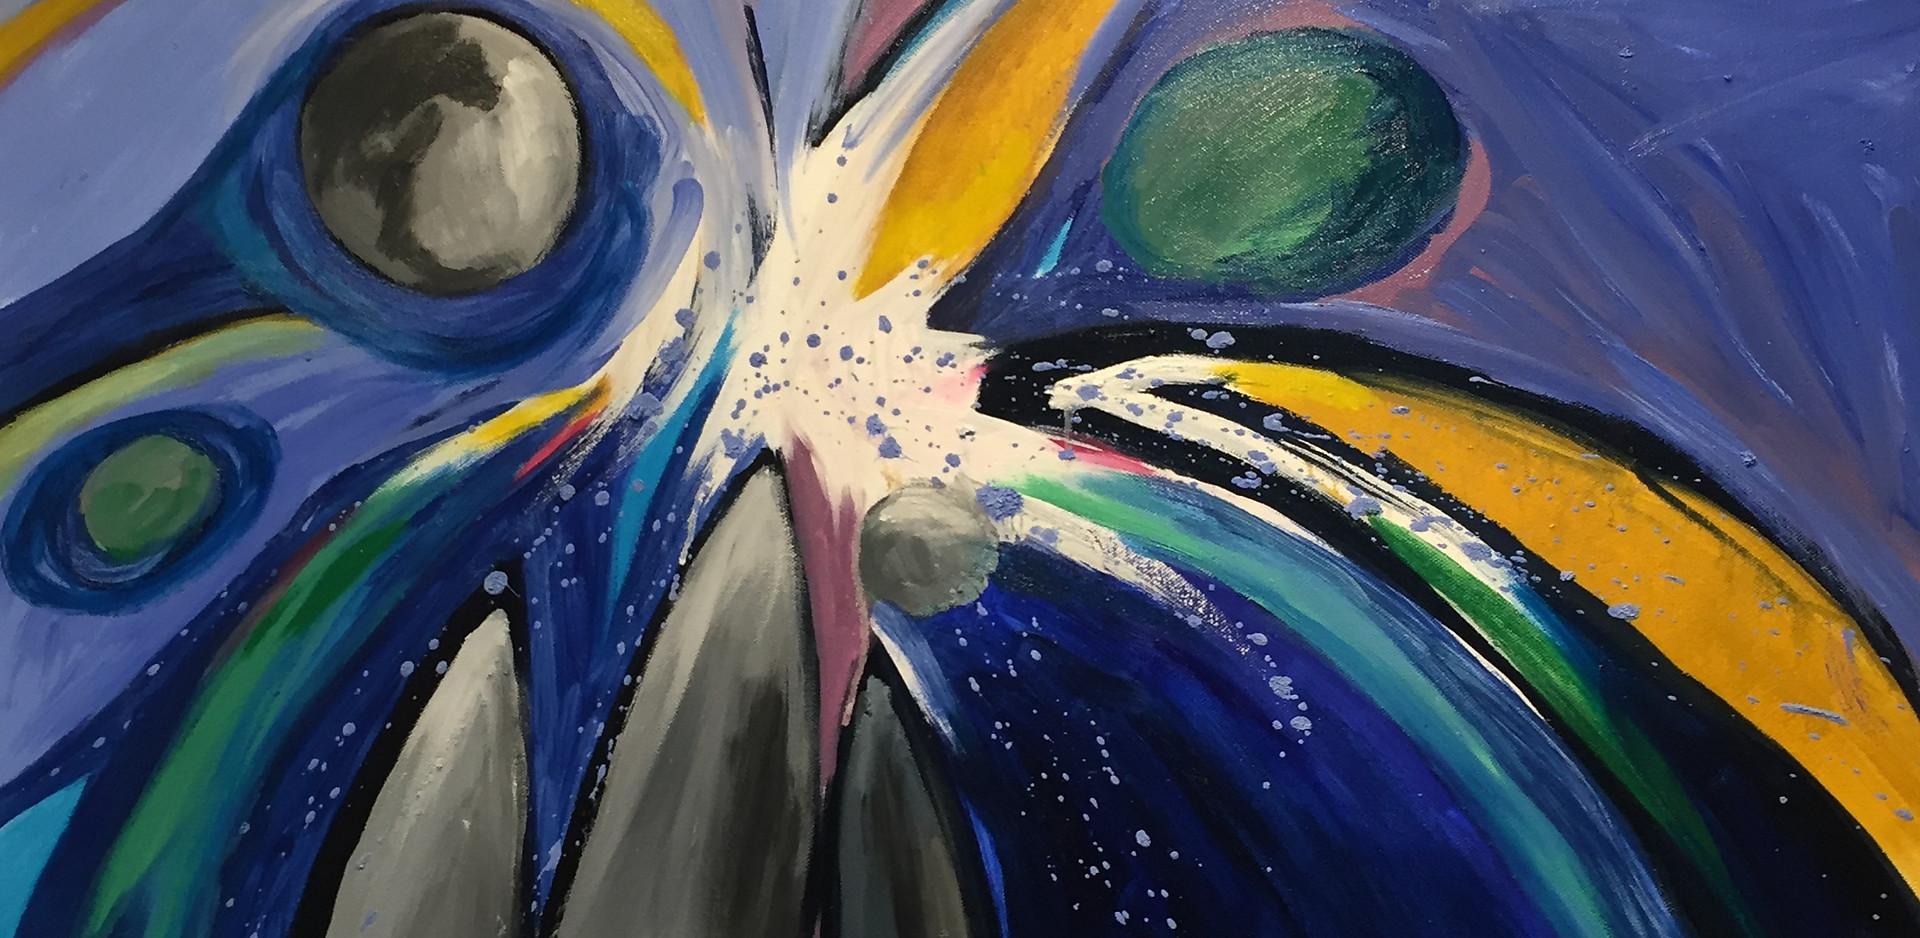 Colliding Asteroids, 24x30